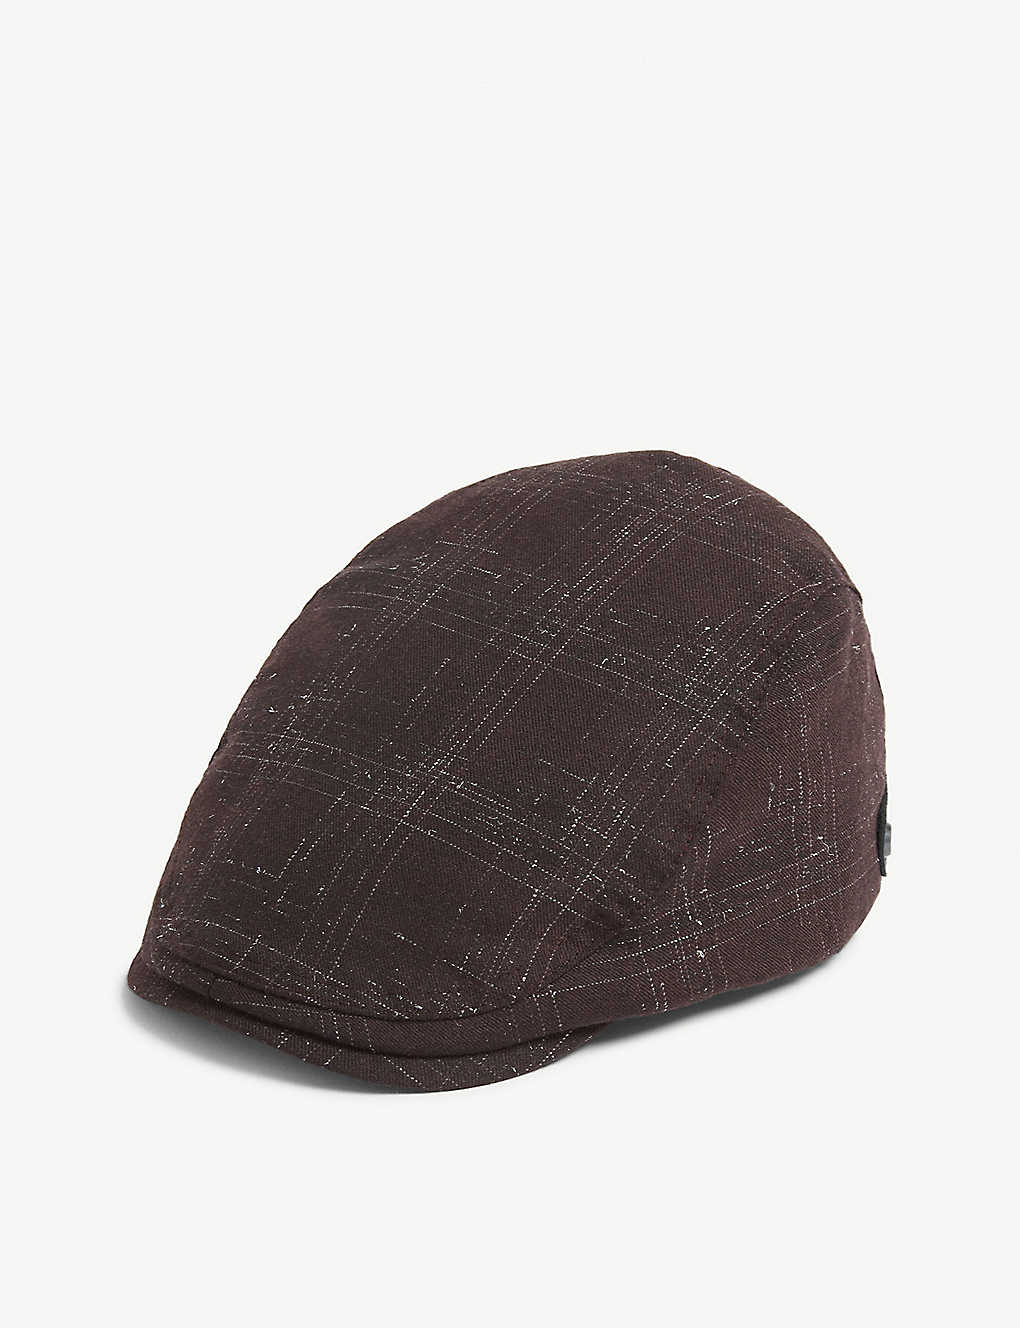 29b70c5c3396e TED BAKER - Jeelin wool-blend flat cap